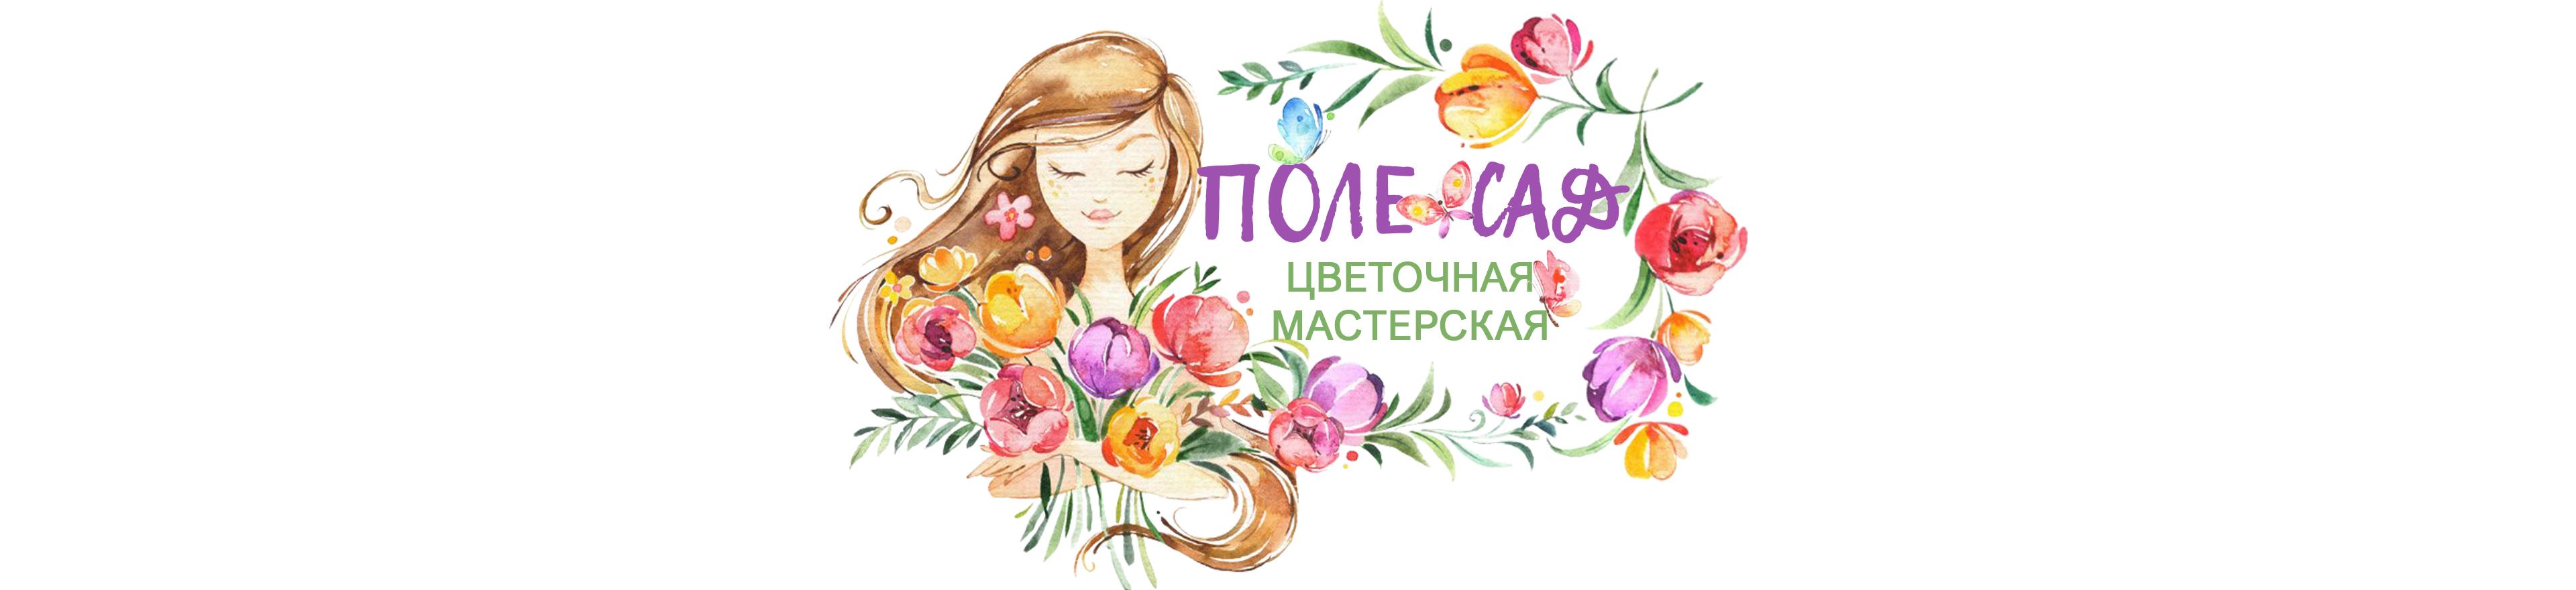 Банер ПолеСад цветочная мастерская